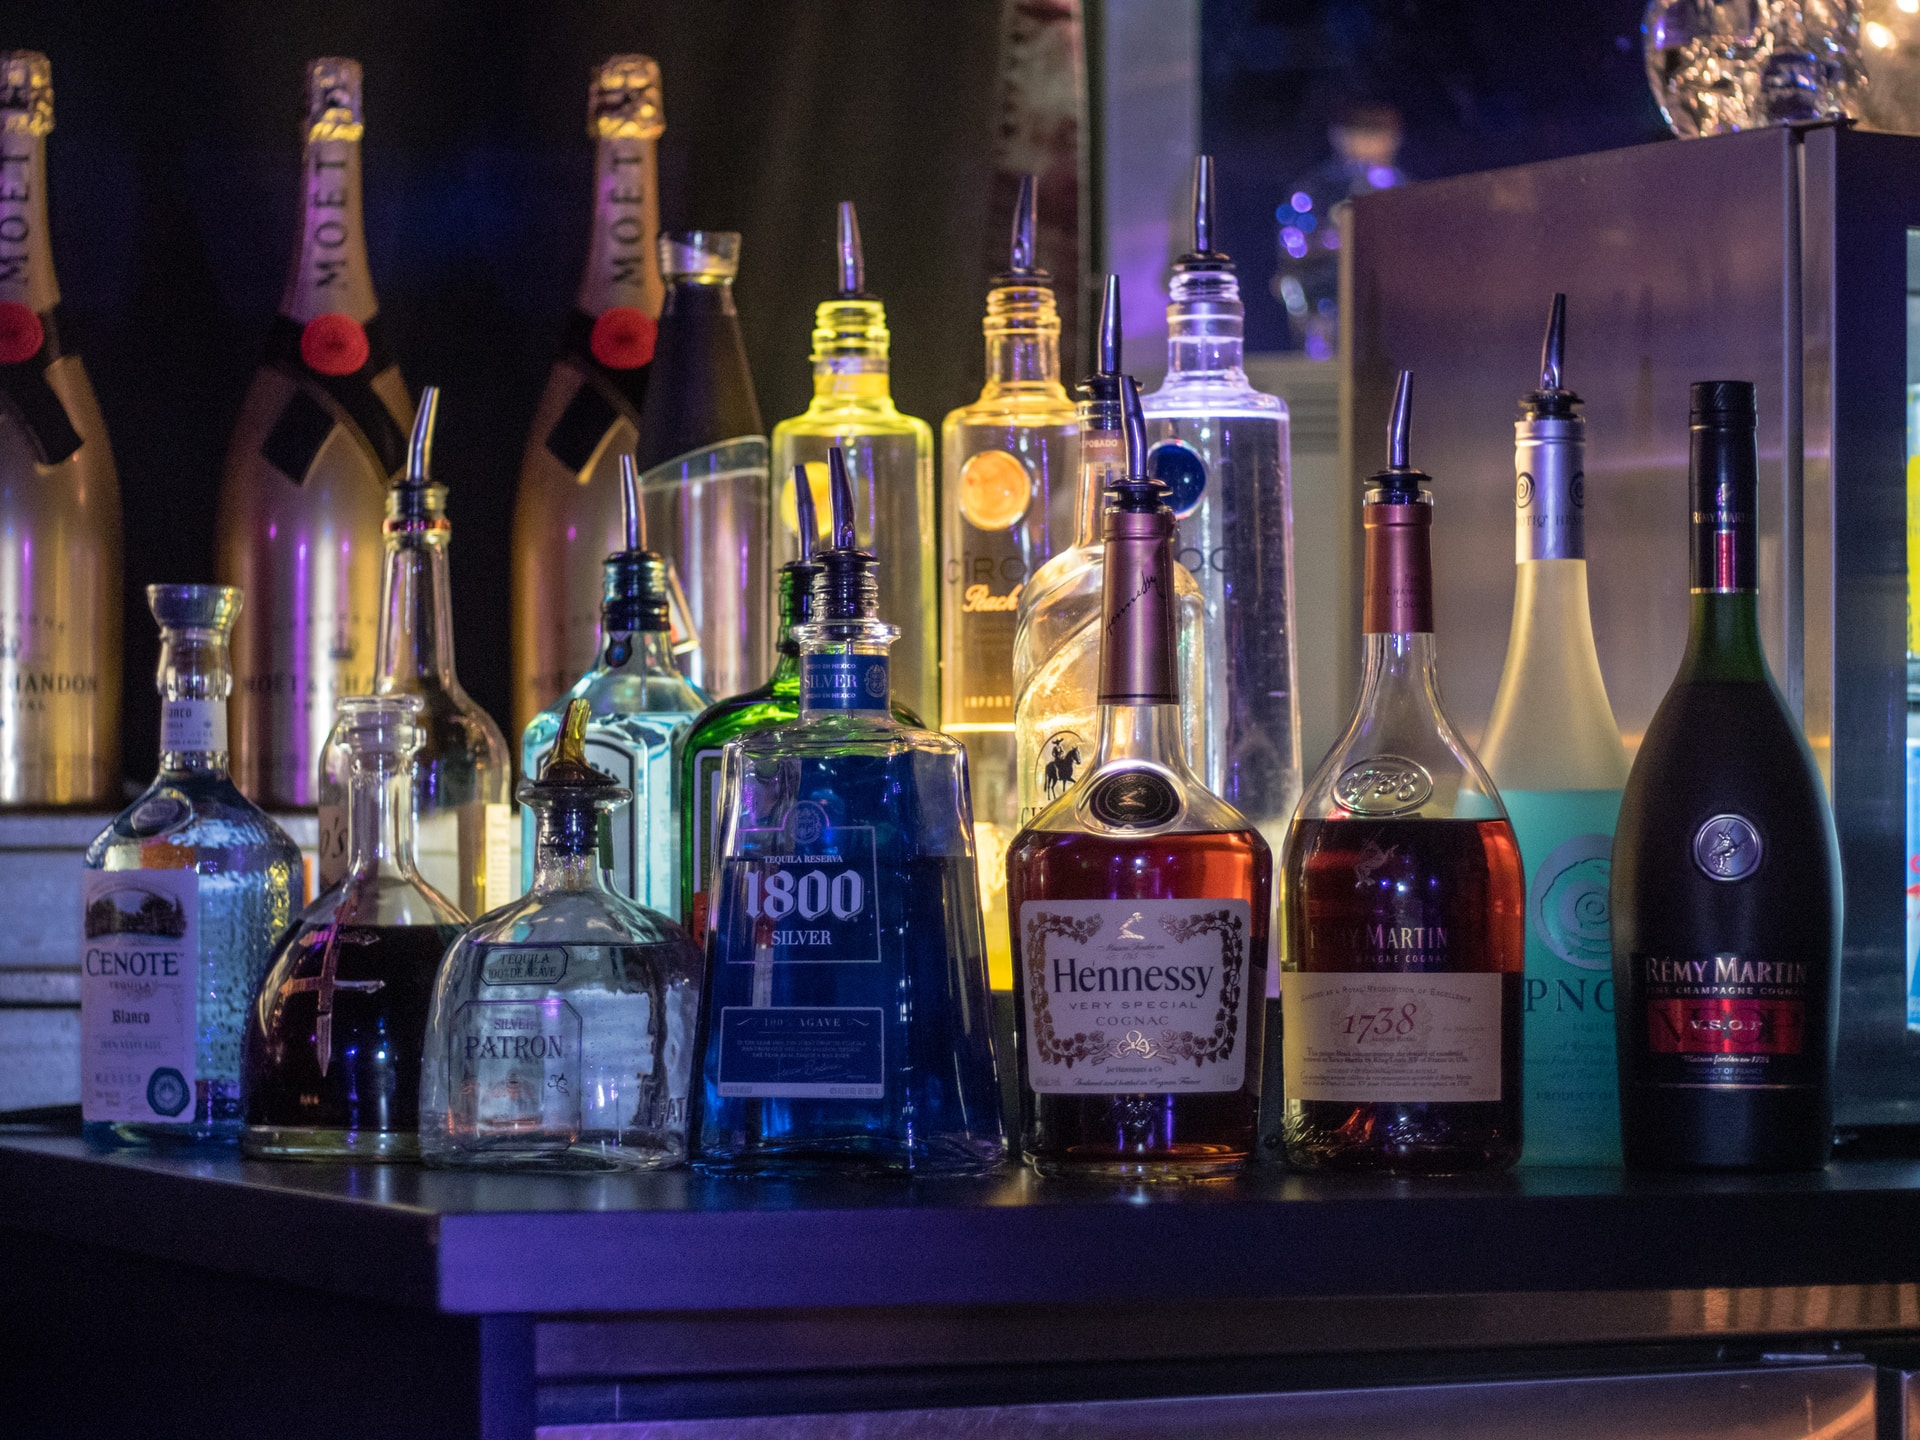 Bar στο σπίτι και πως να το εφοδιάσετε για ένα γαμήλιο ή pre-wedding party